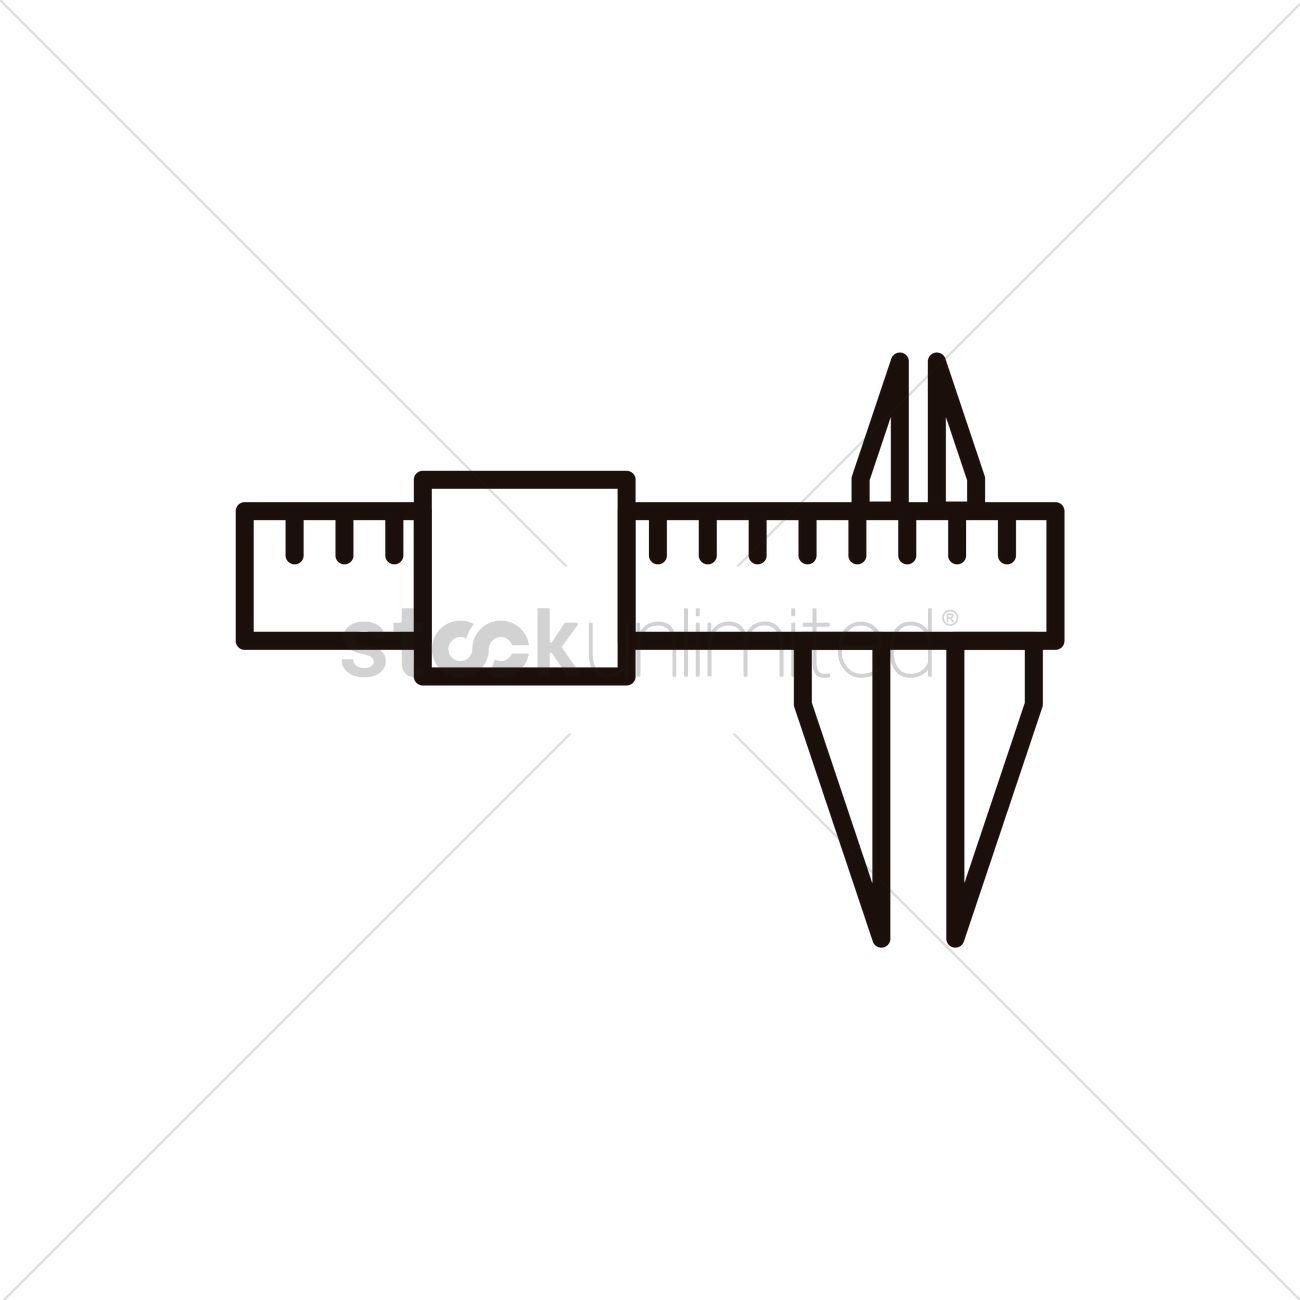 Vernier Calipers Vector Image 1633954 Stockunlimited Caliper Diagram Graphic